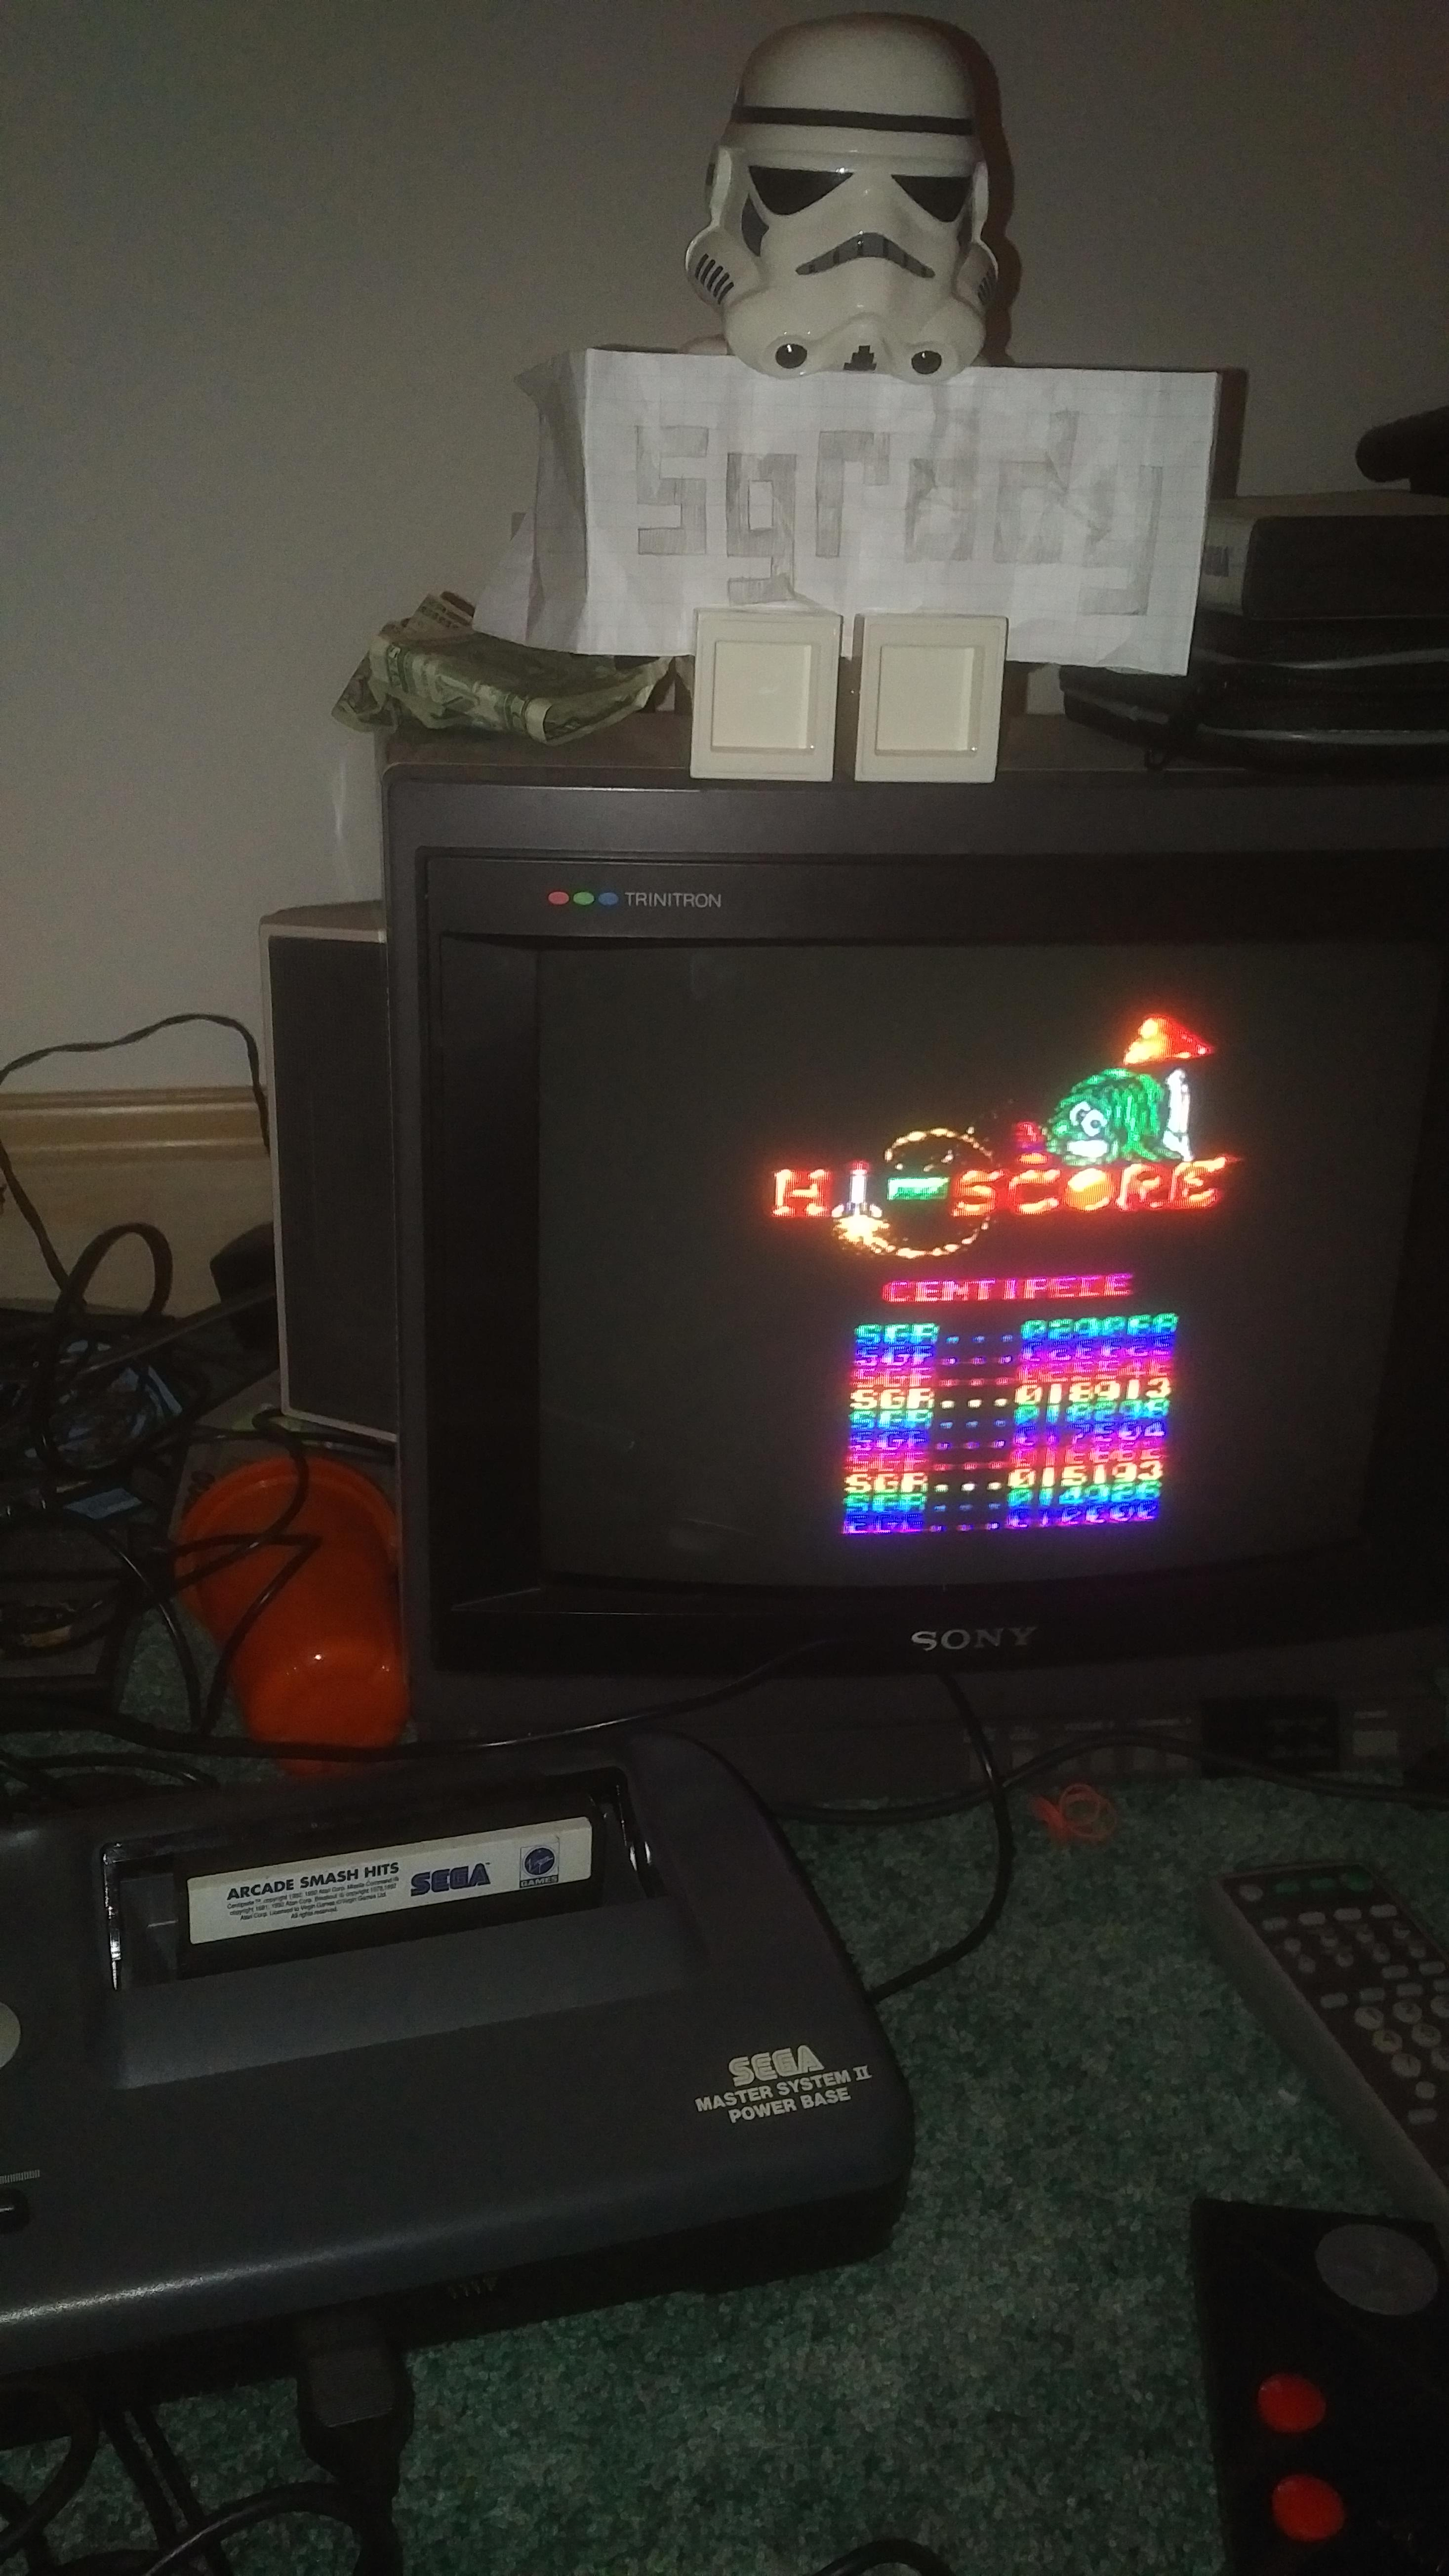 sgrddy: Arcade Smash Hits: Centipede (Sega Master System) 29,068 points on 2018-01-27 18:57:43